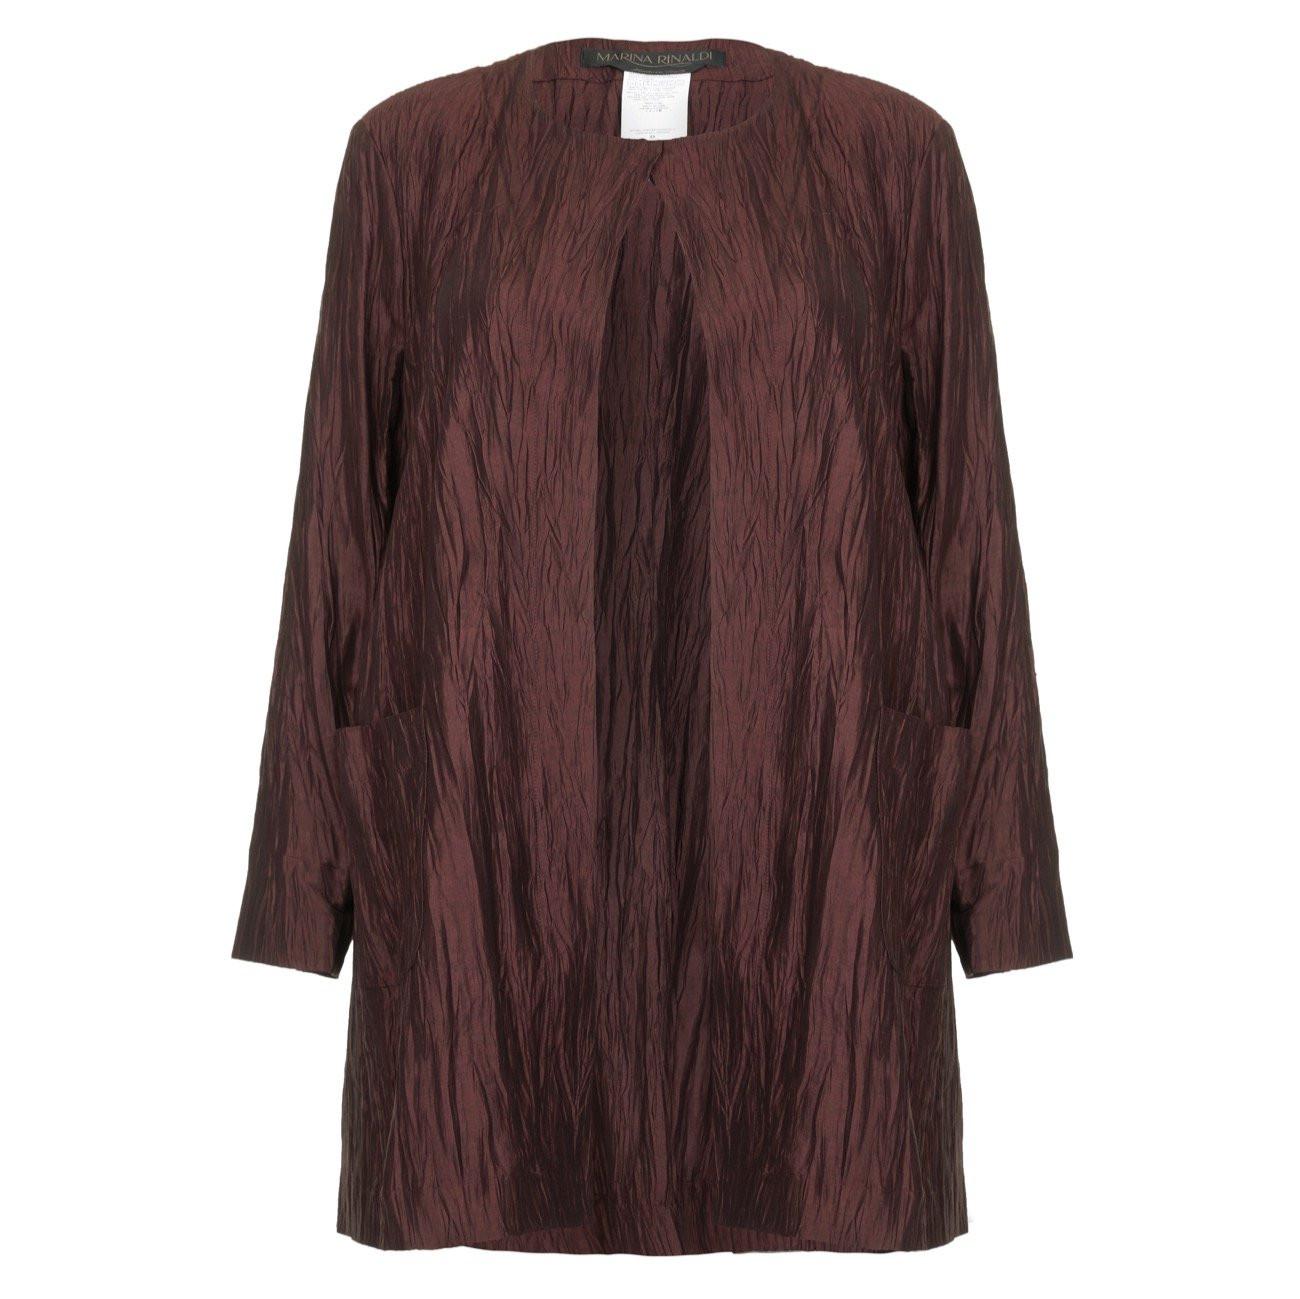 Marina Rinaldi Mahogany Crushed Linen Silk Jacket